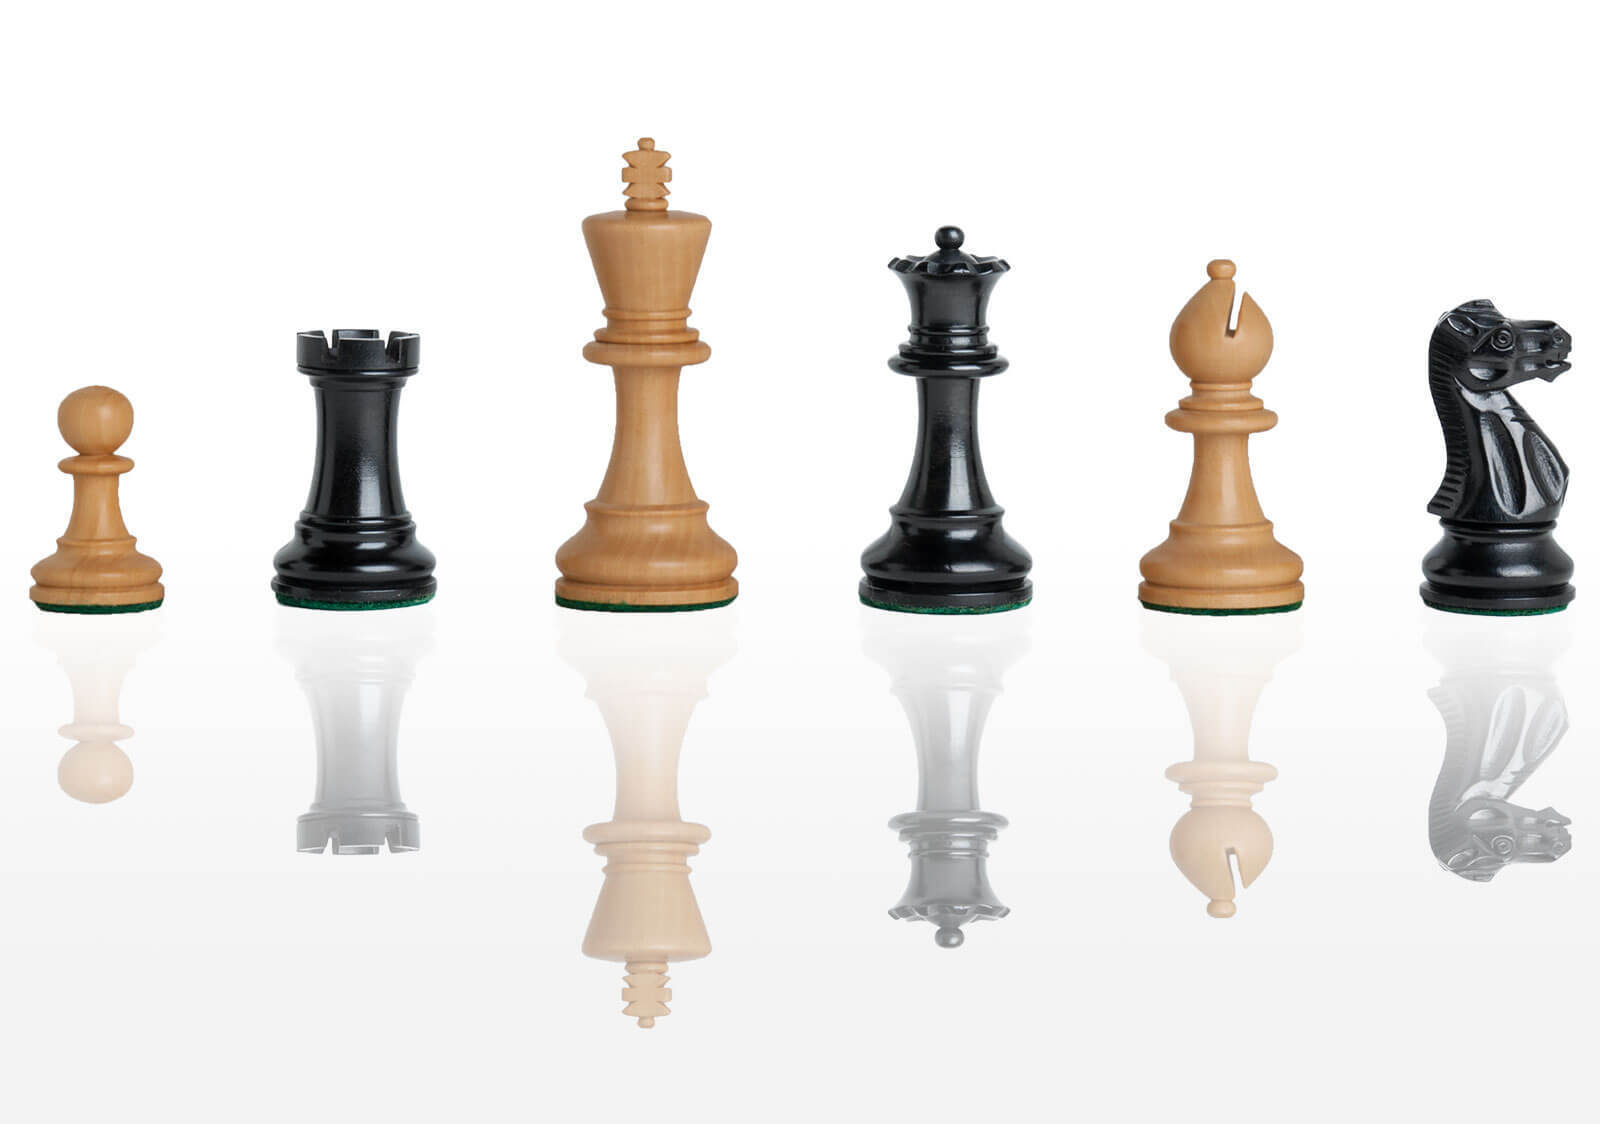 The Grandmaster Chess Set - Pieces Only - 3.25  King - Ebonized Boxwood